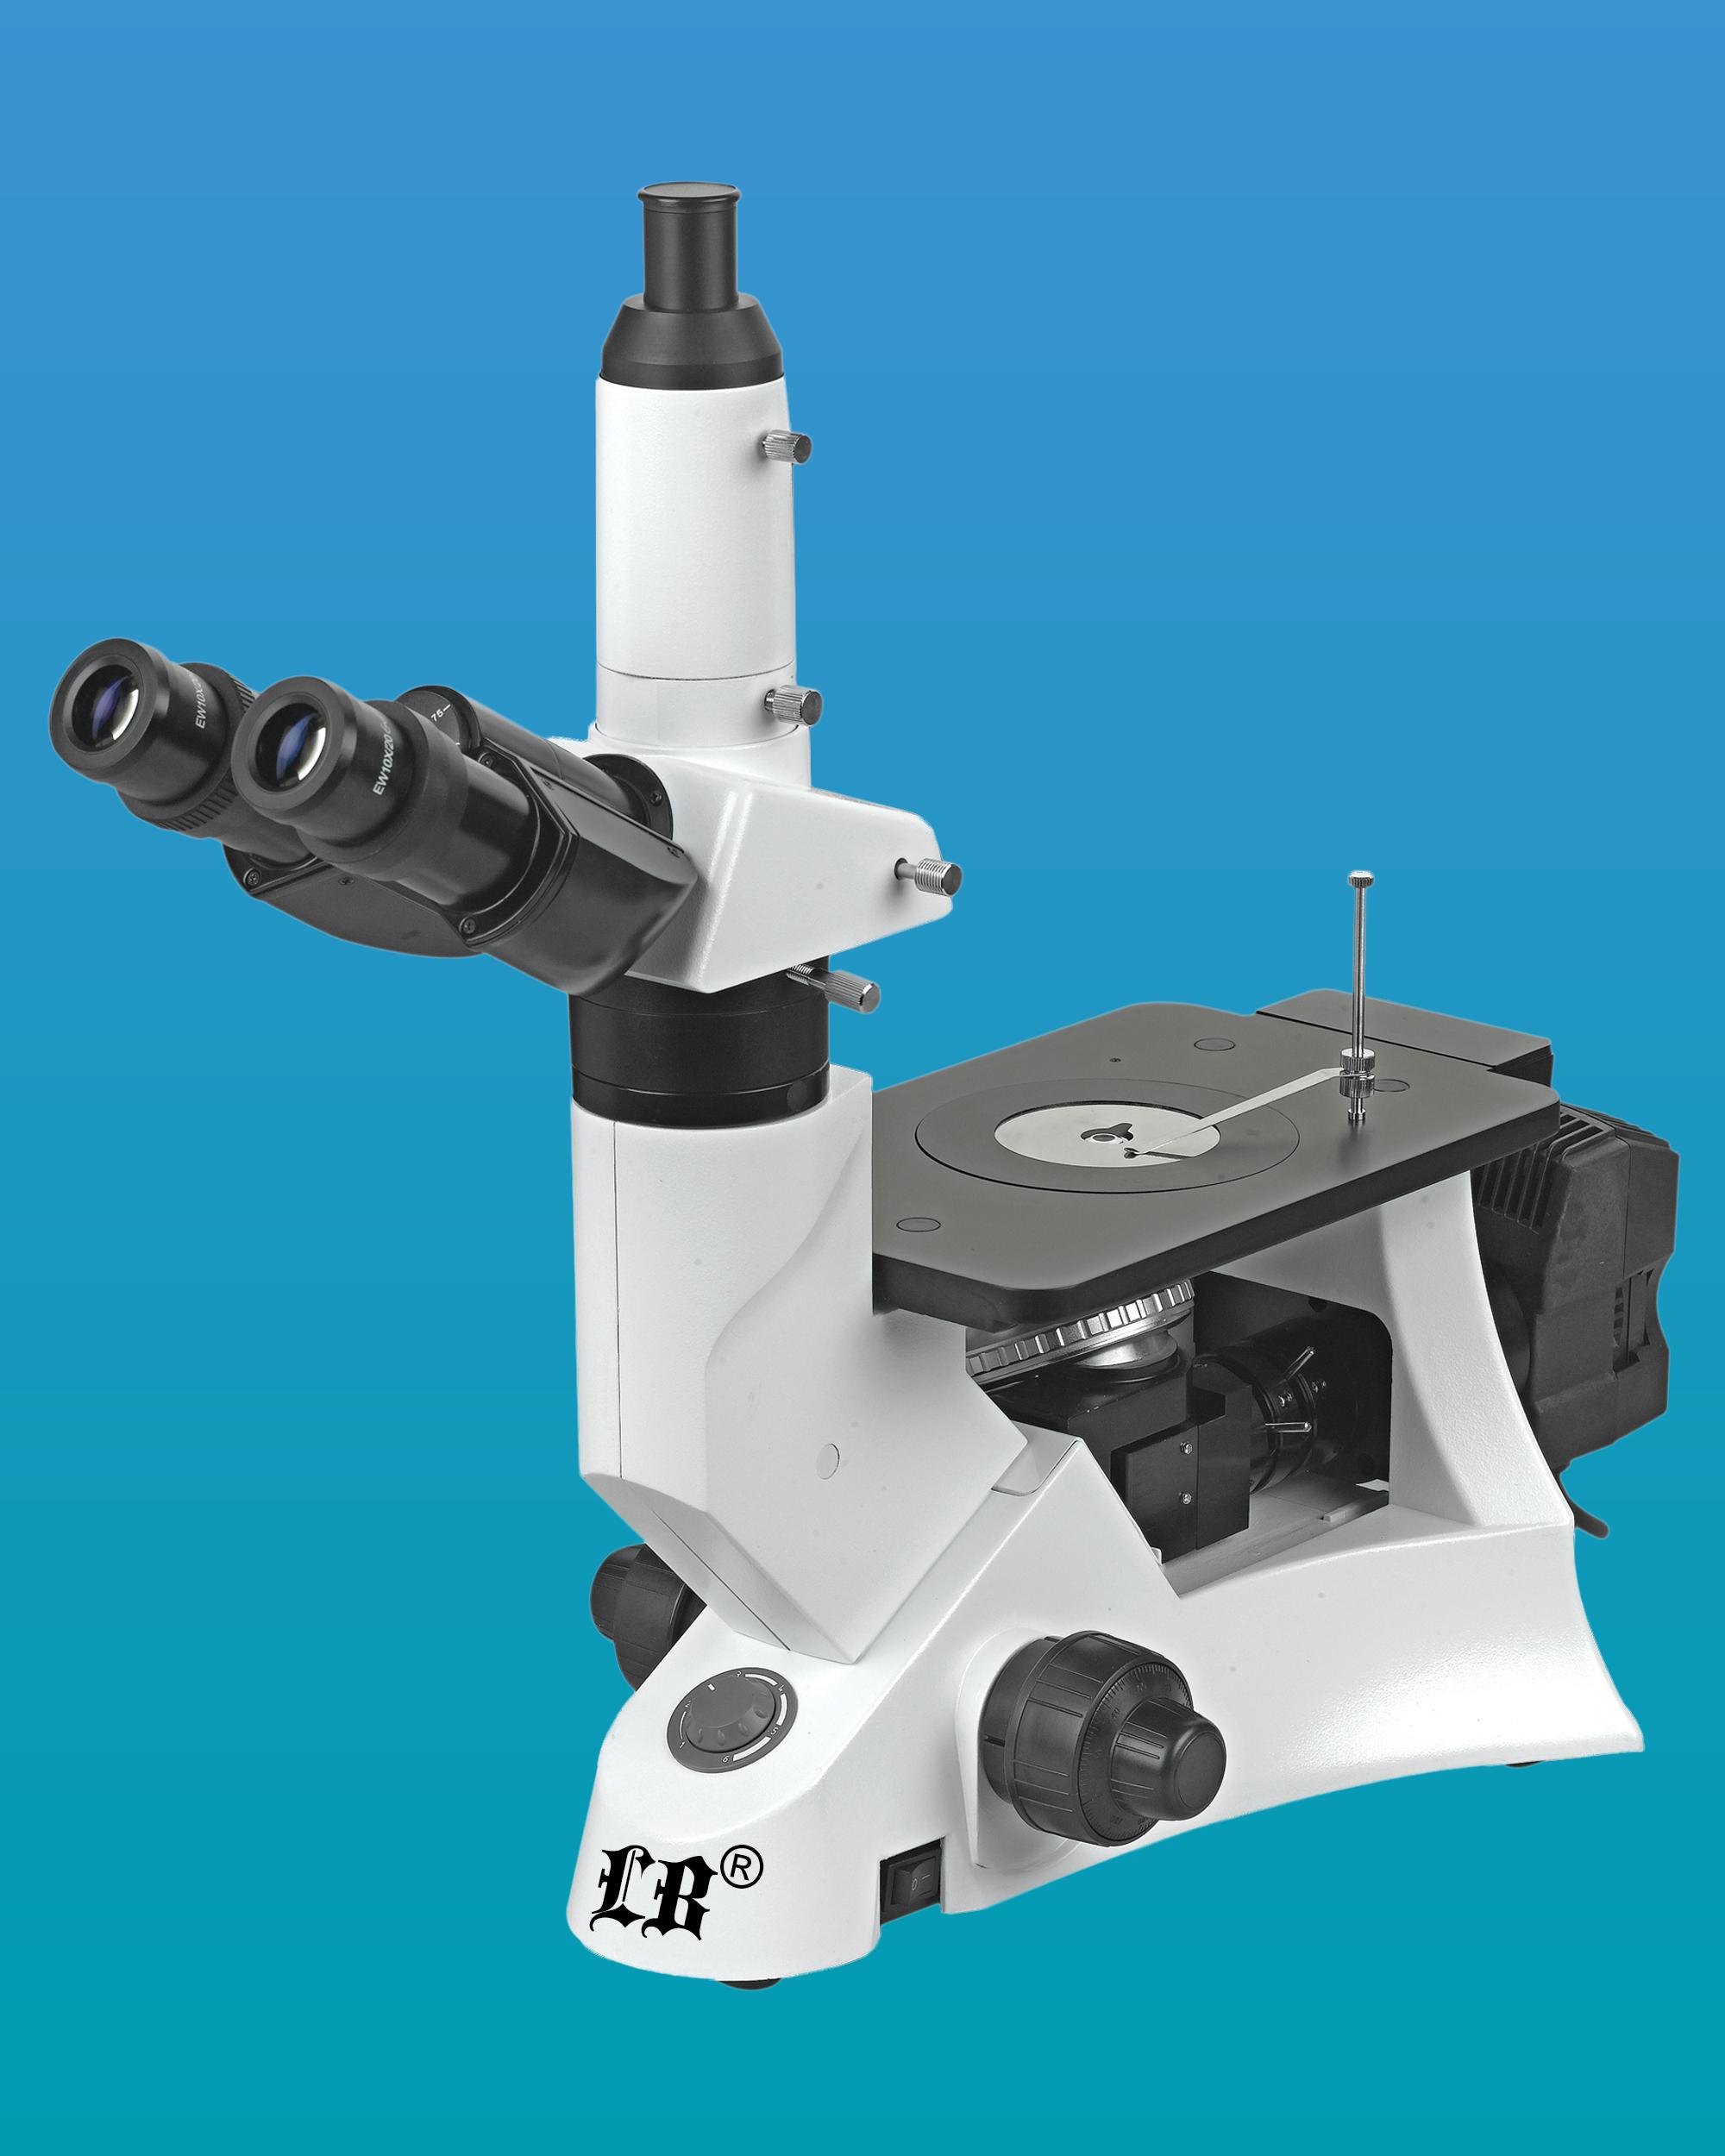 [LB-602] Trinocular Inverted Metallurgical Microscope w/ Infinite Optical System